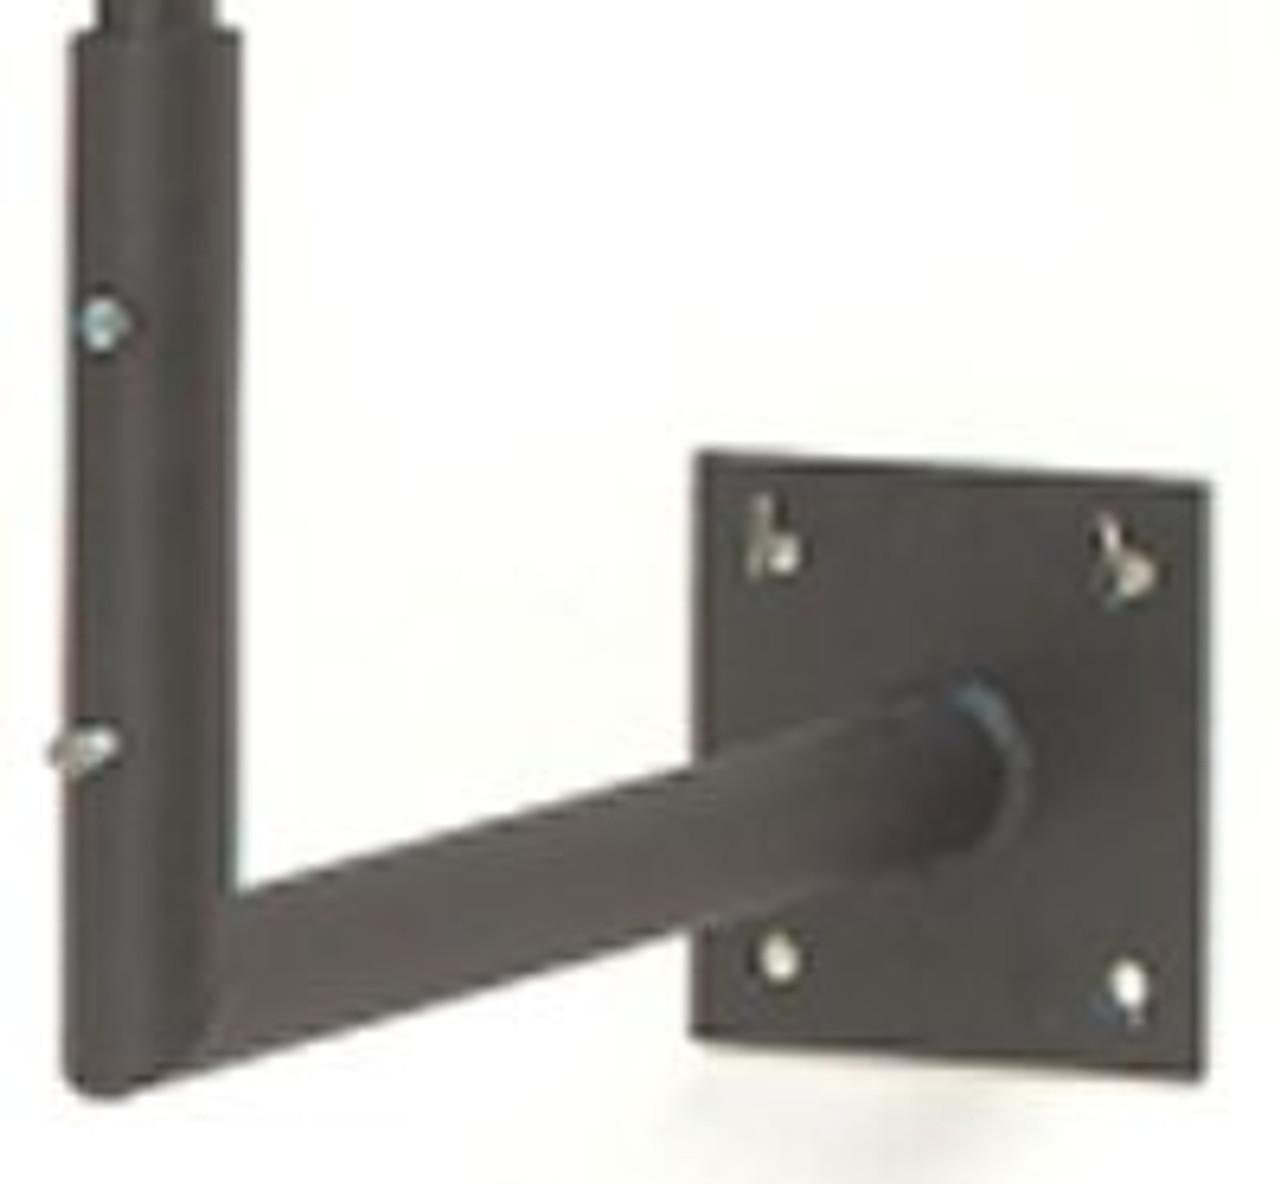 Upper Deck Mount - Wall - Steel Arm